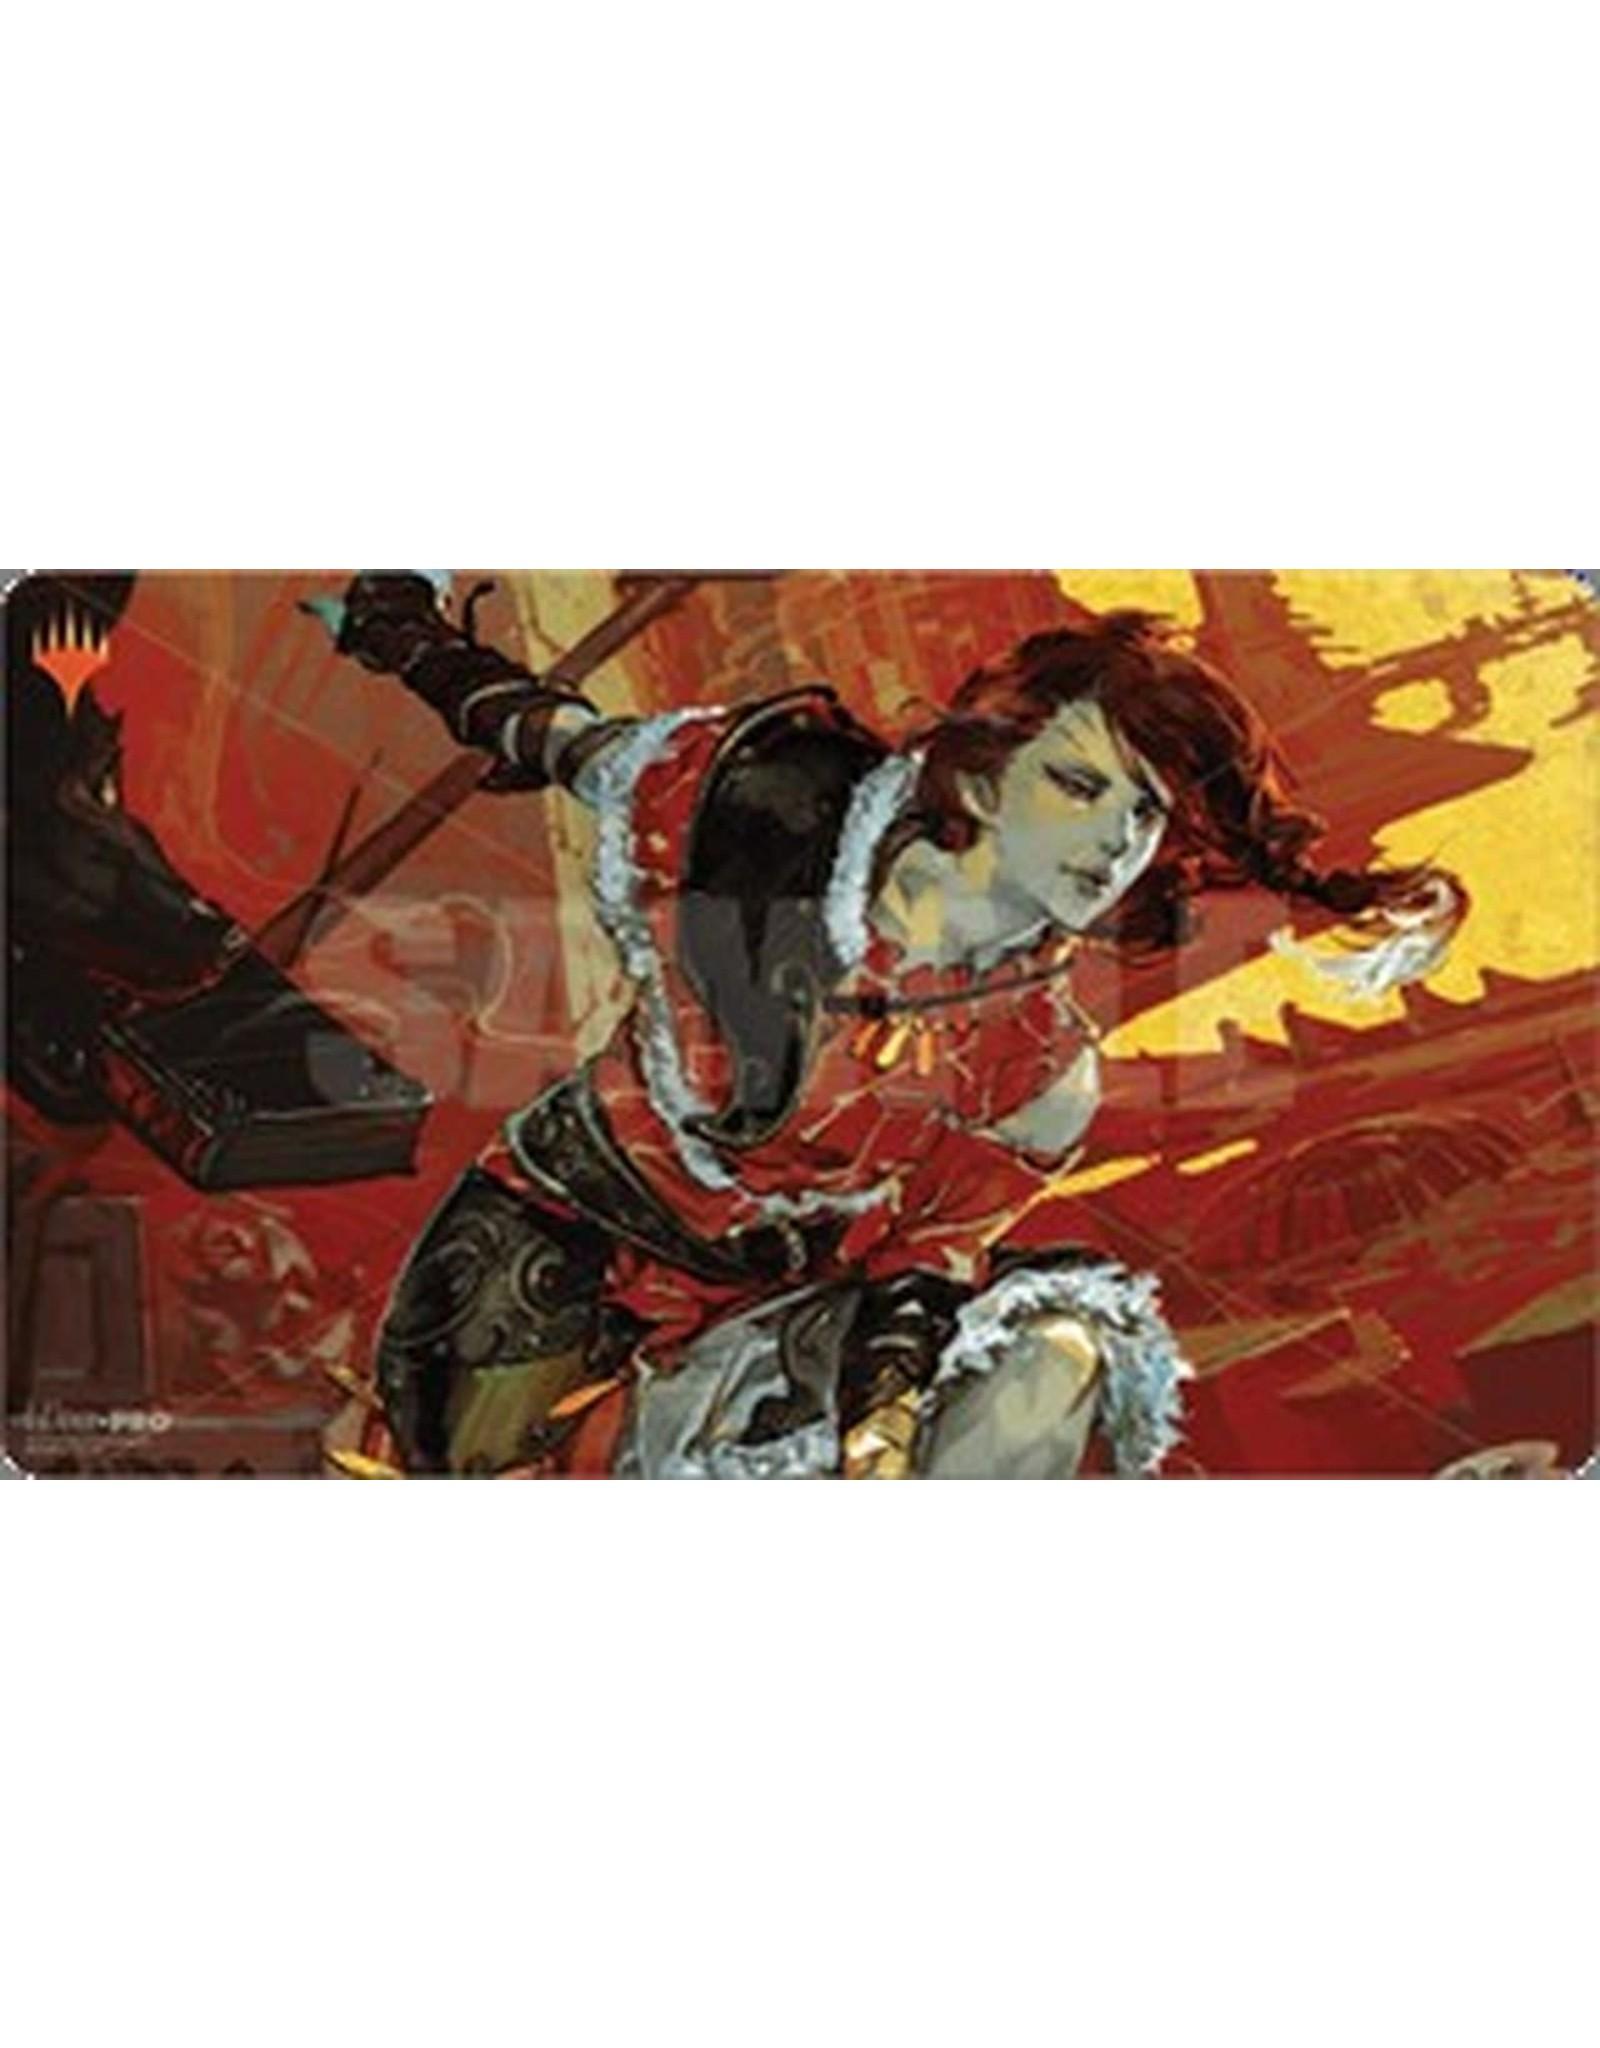 Ultra Pro Magic the Gathering: War of the Spark Japanese Alt. Art Play Mat - Arlinn Kord